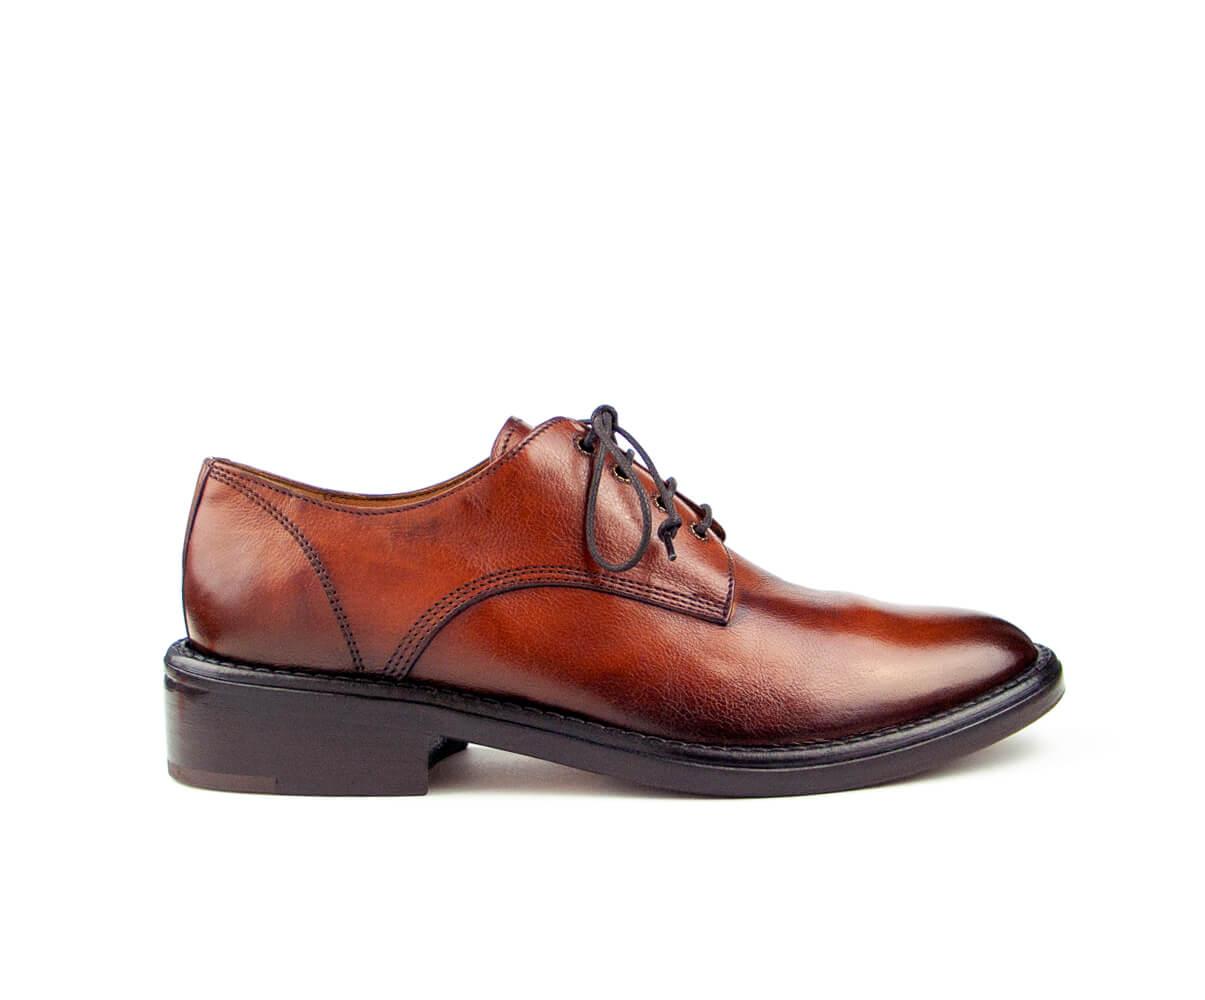 010 ecla scarpe rgb